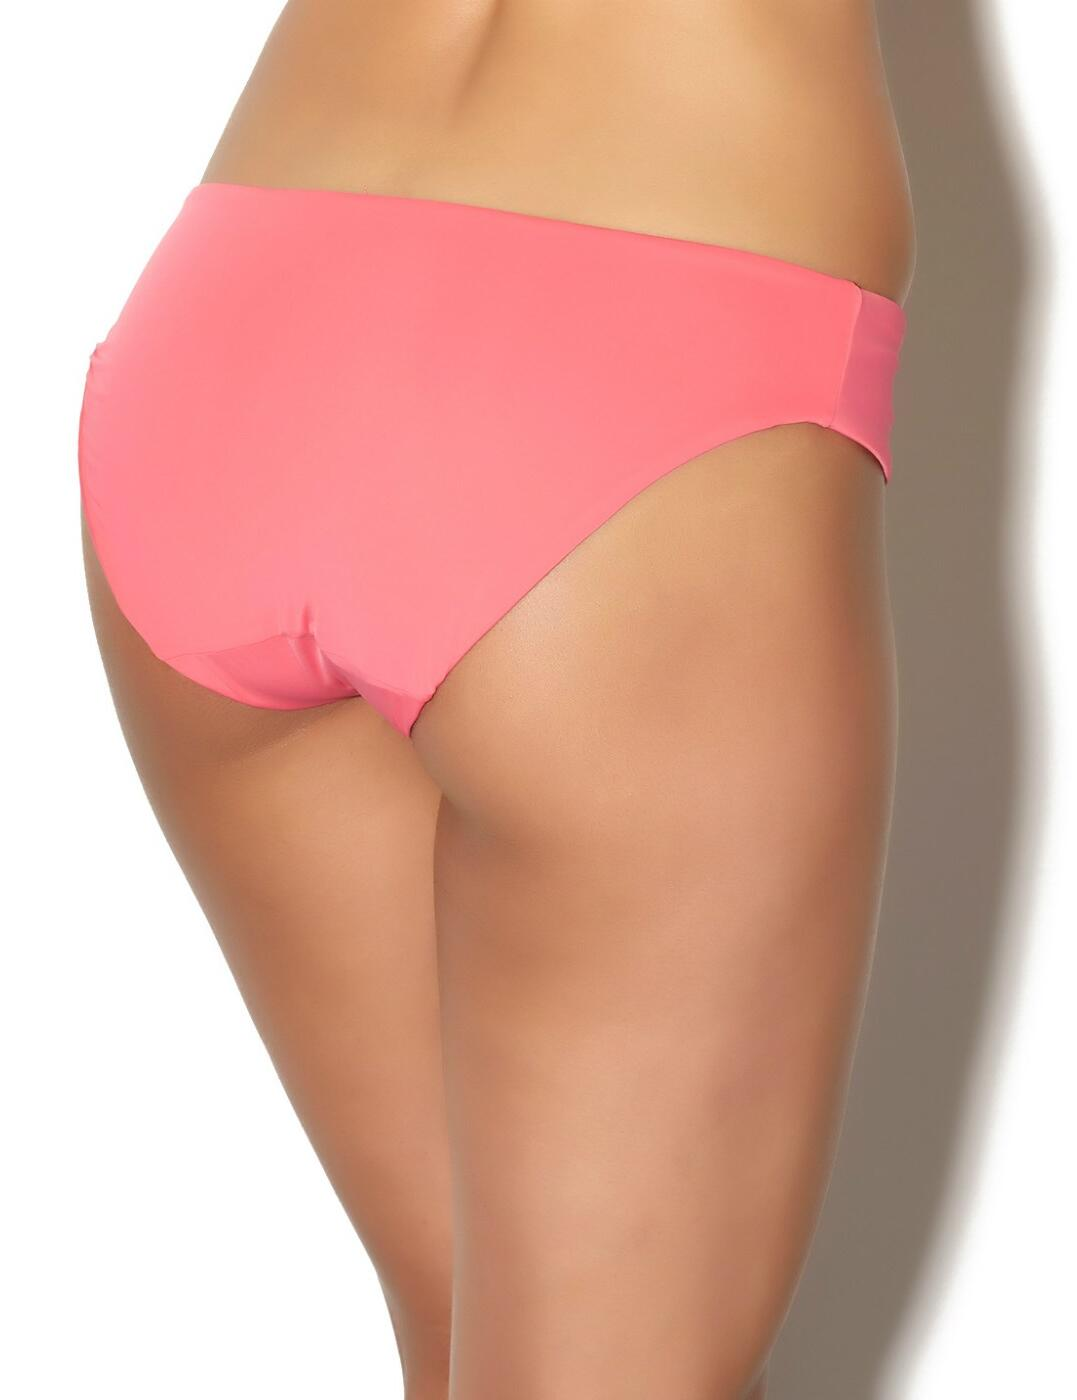 Aubade Swimwear Esprit Sauvage Brazilian Bikini Brief Bottoms Pant AK22-2